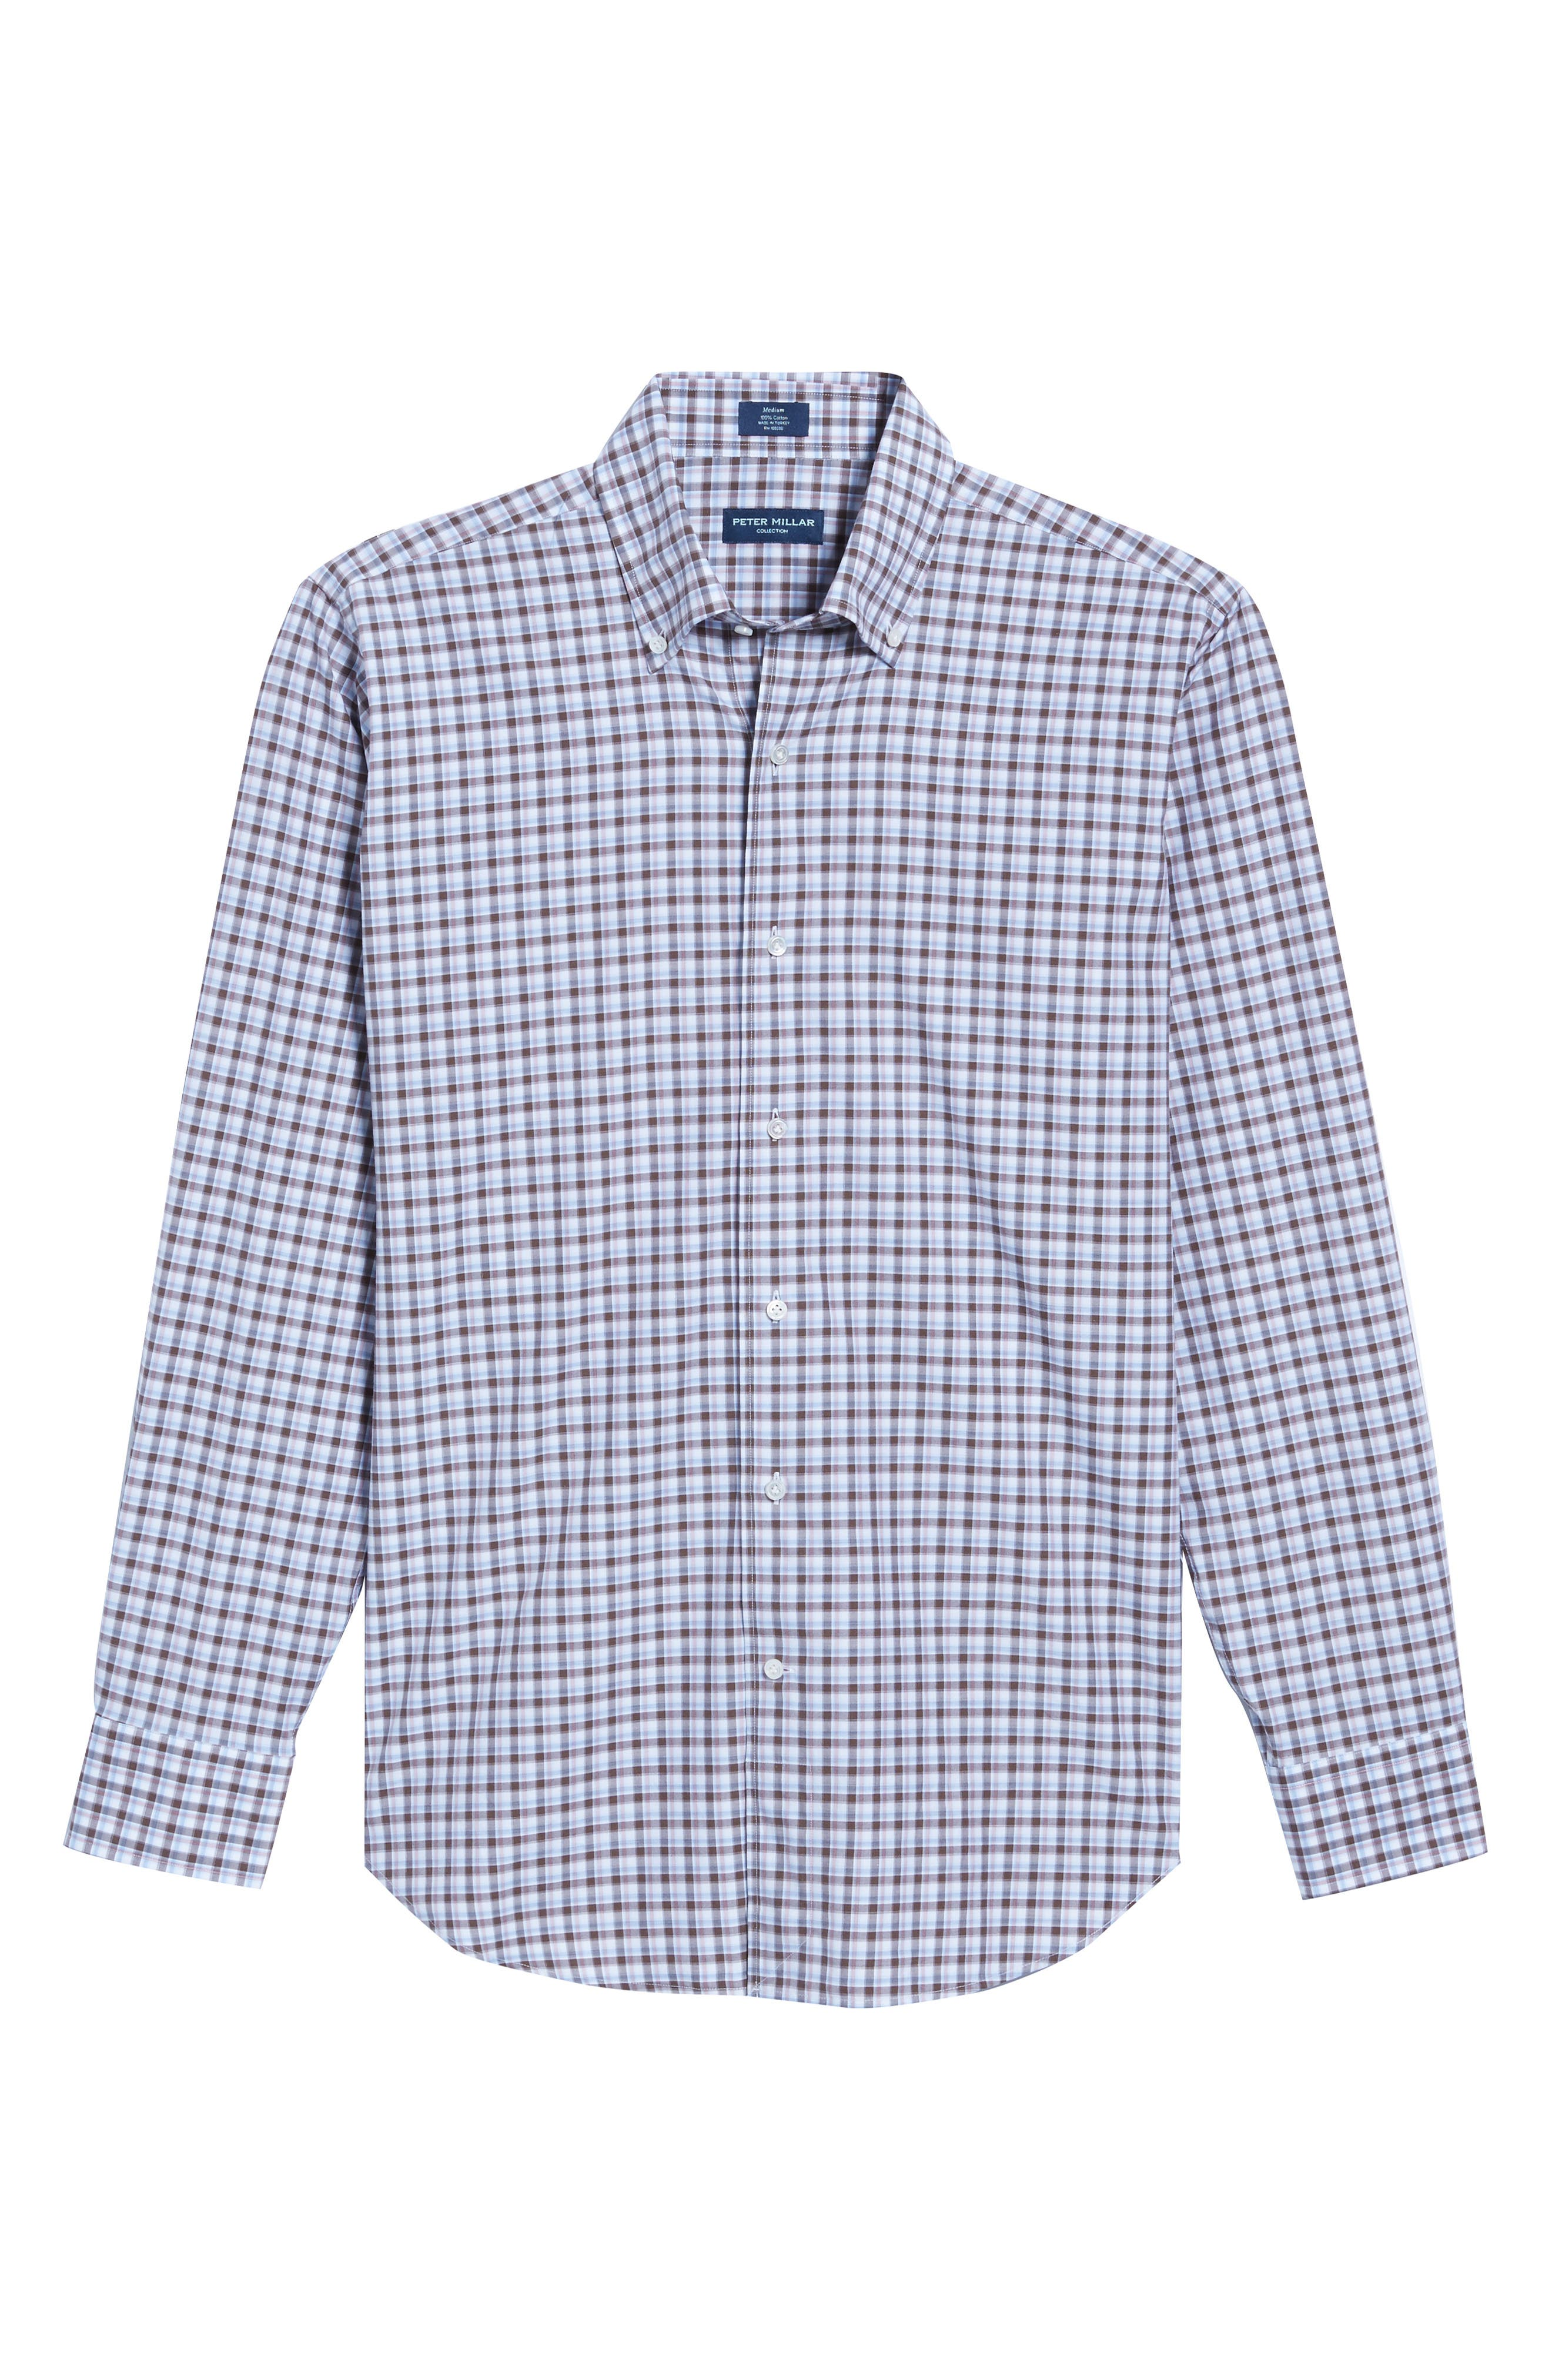 Peter Millar Northern Lights Regular Fit Check Sport Shirt,                             Alternate thumbnail 6, color,                             203